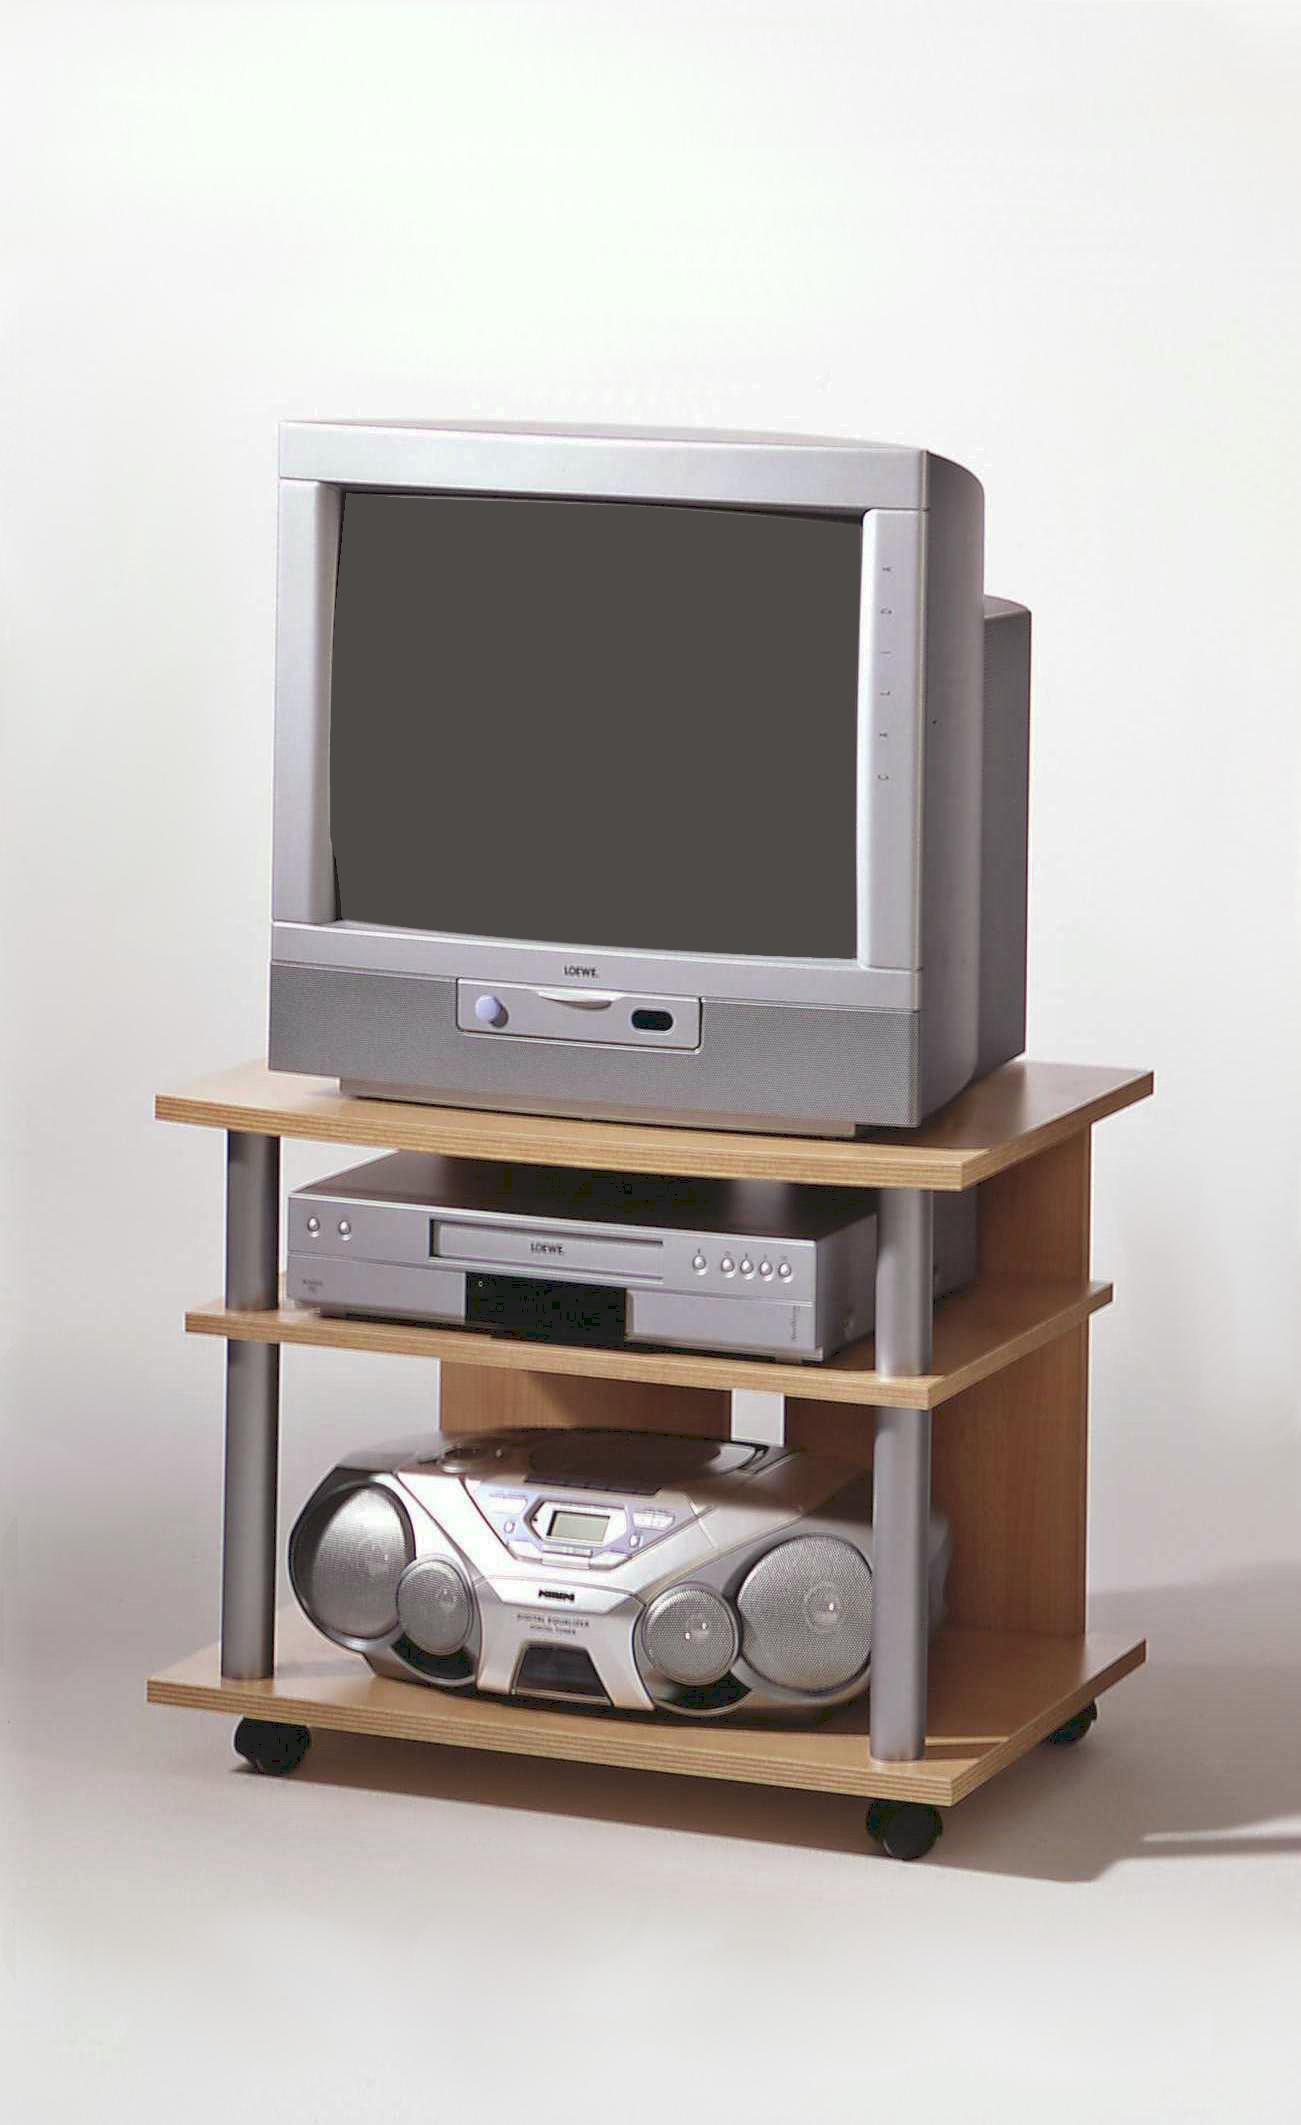 phonoregal mod f001 buche ebay. Black Bedroom Furniture Sets. Home Design Ideas